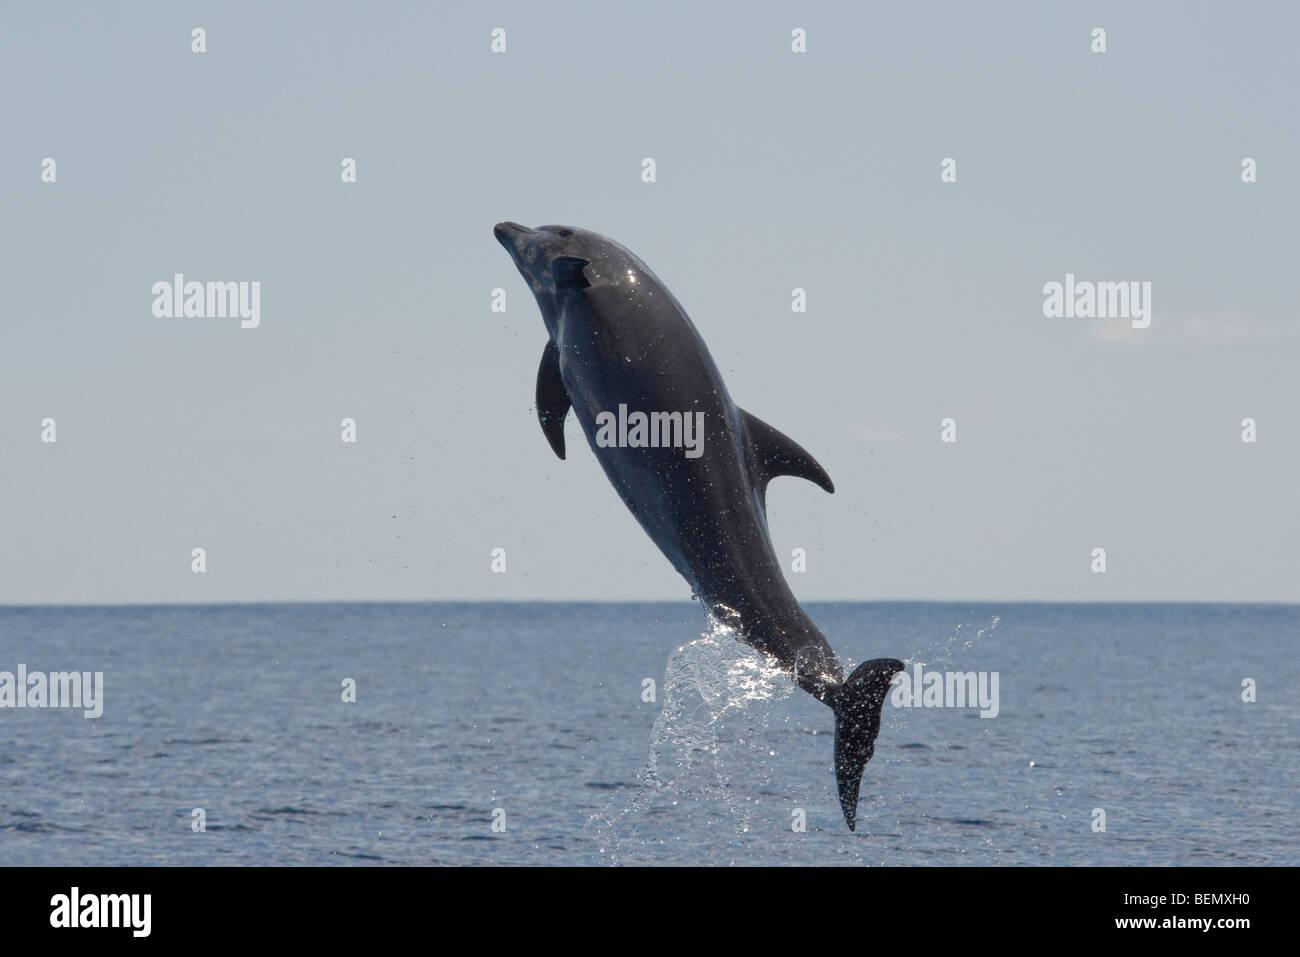 Common Bottlenose Dolphin, Tursiops truncatus. Costa Rica, Pacific Ocean. - Stock Image